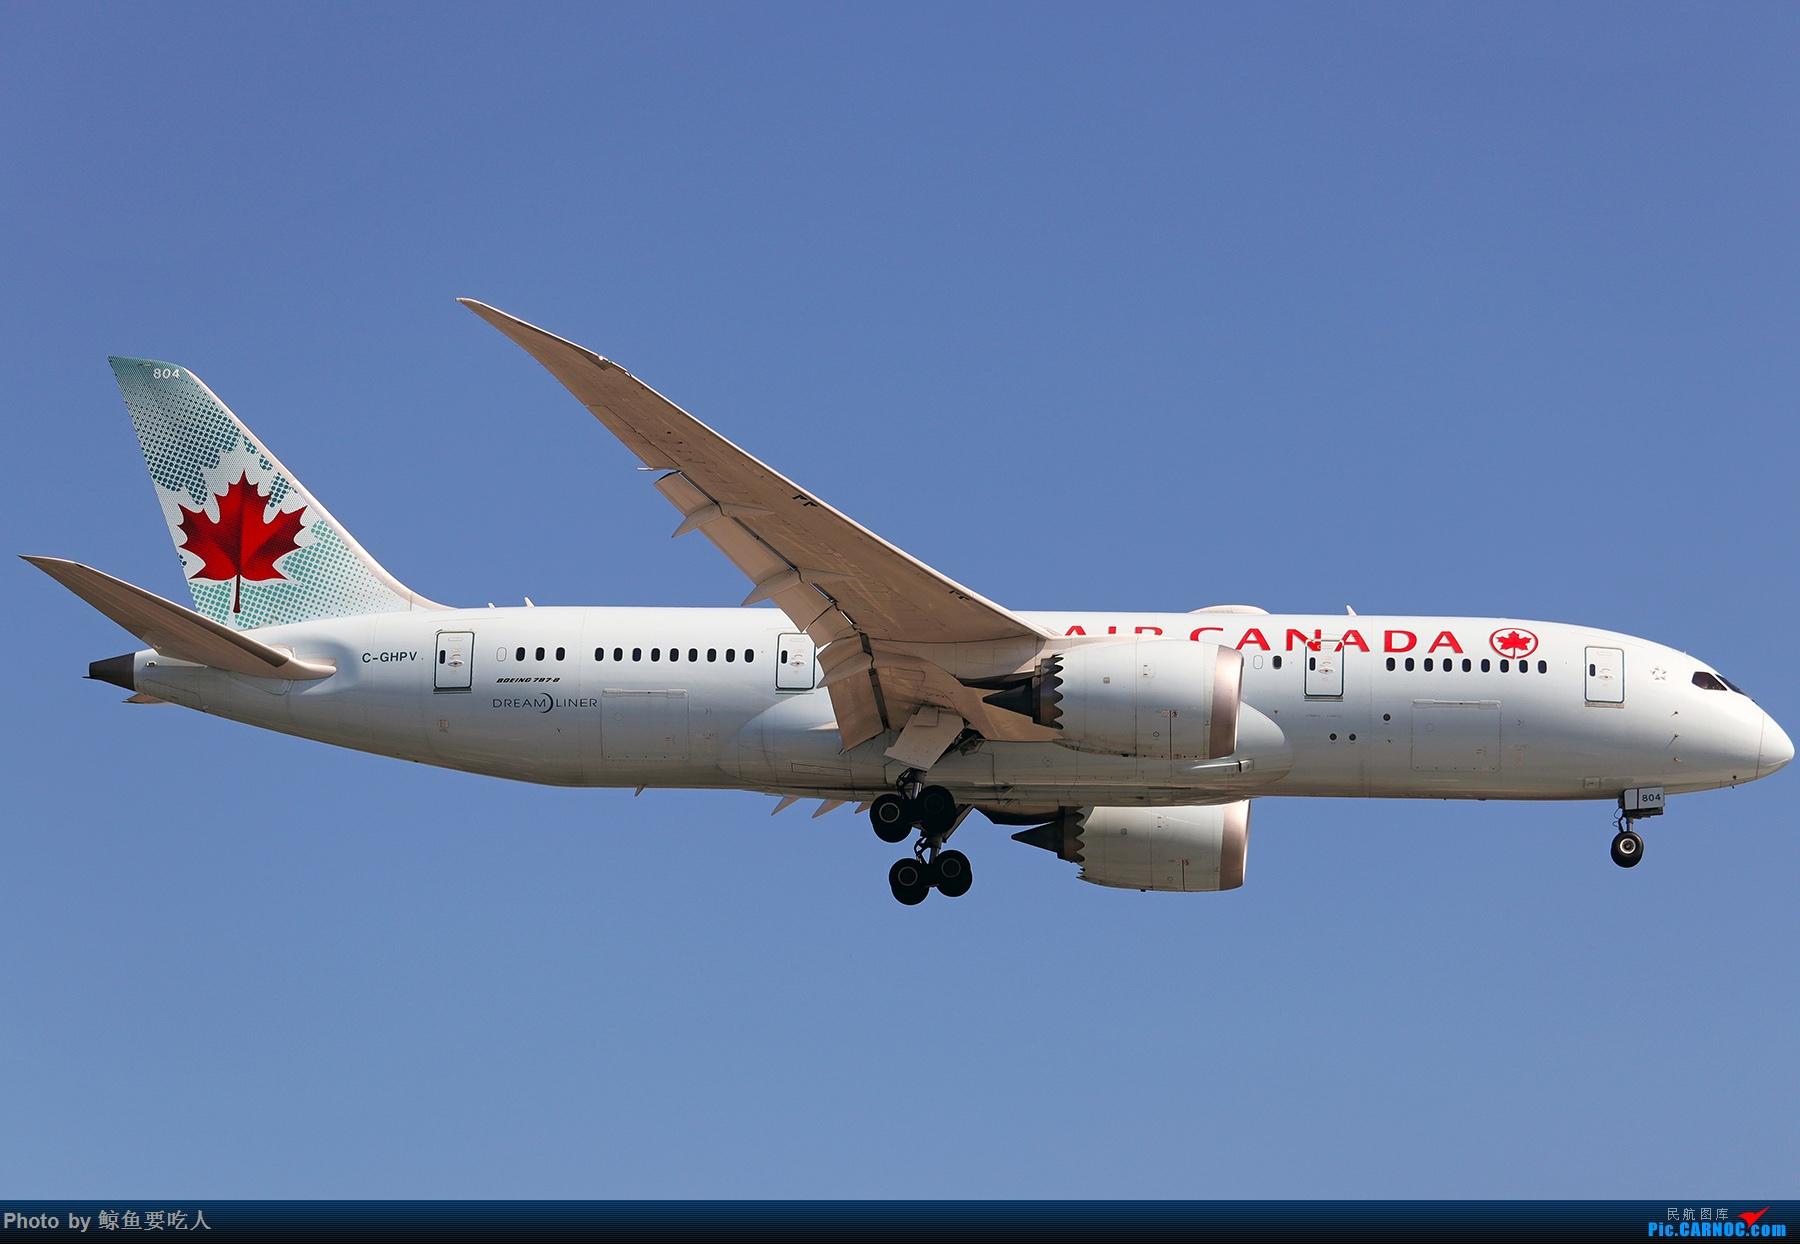 Re:[原创]【多图党】见证疫情后逐步的恢复,加拿大夏日多伦多皮尔逊机场拍机~ 乐见诸航空公司复航多伦多 BOEING 787-8 C-GHPV 多伦多皮尔逊国际机场